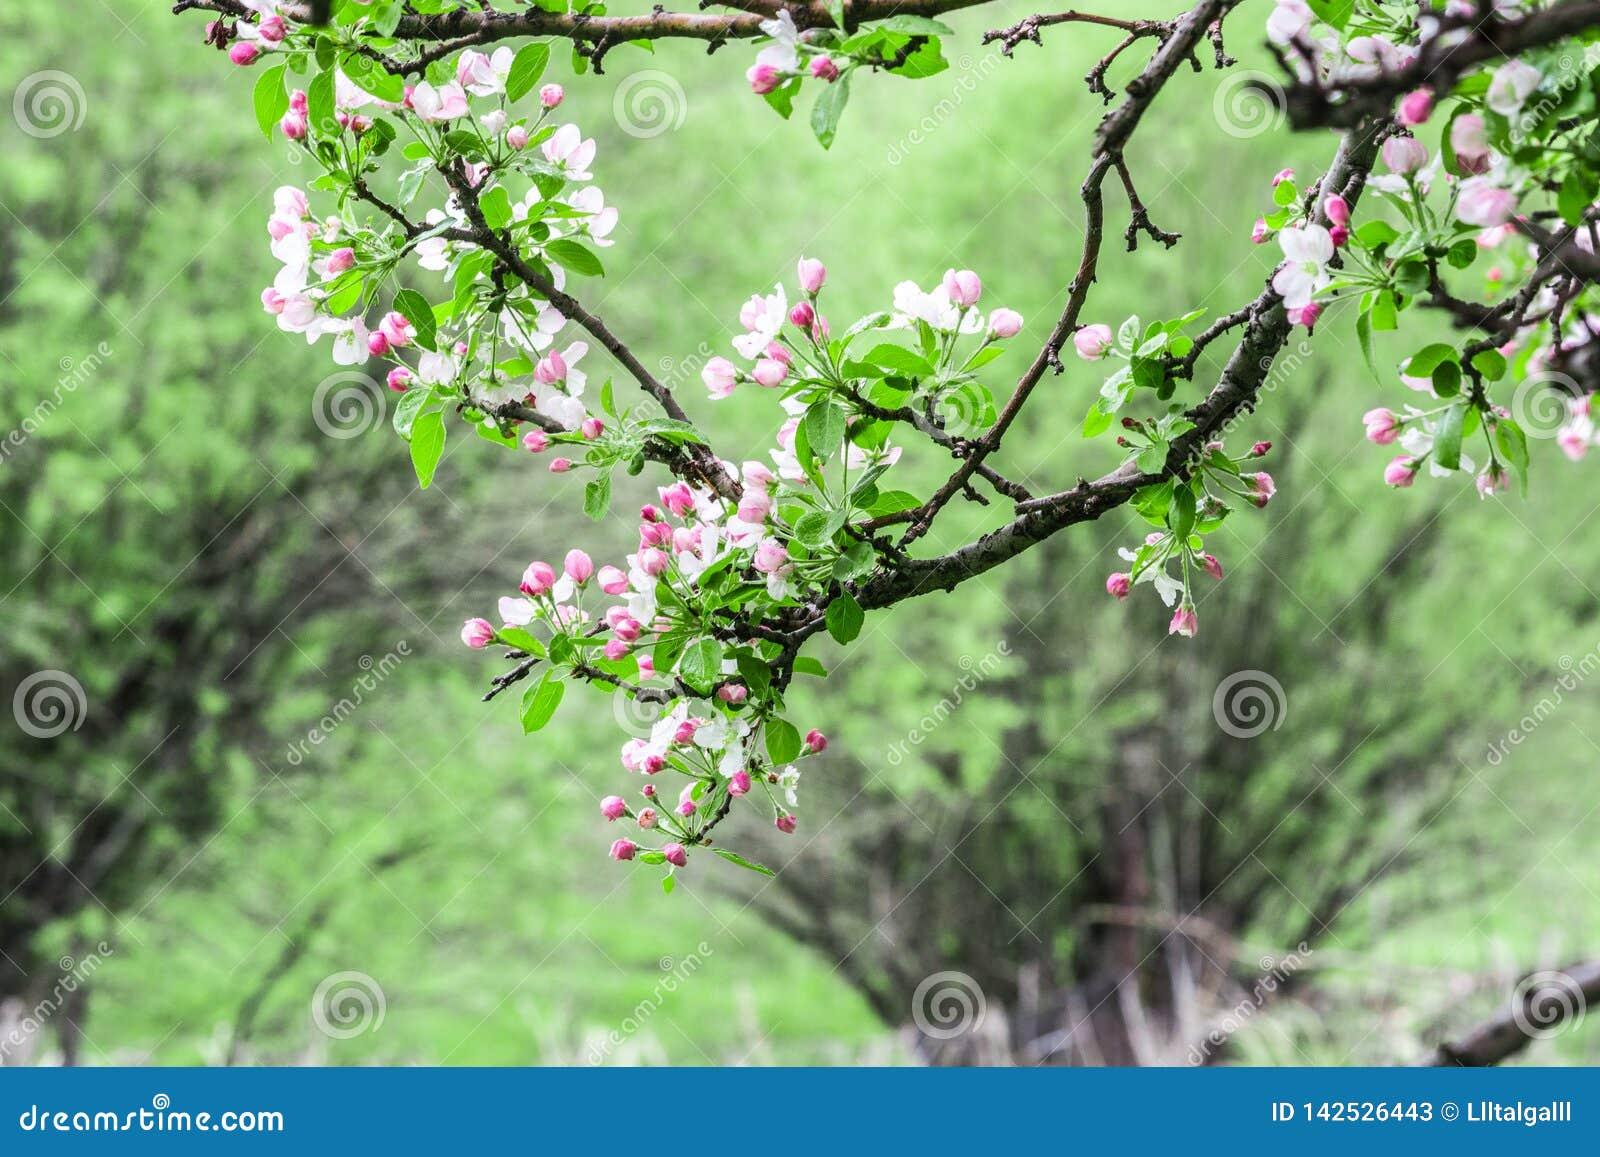 Pommiers fleuris Nature dans Tekeli Ressort kazakhstan